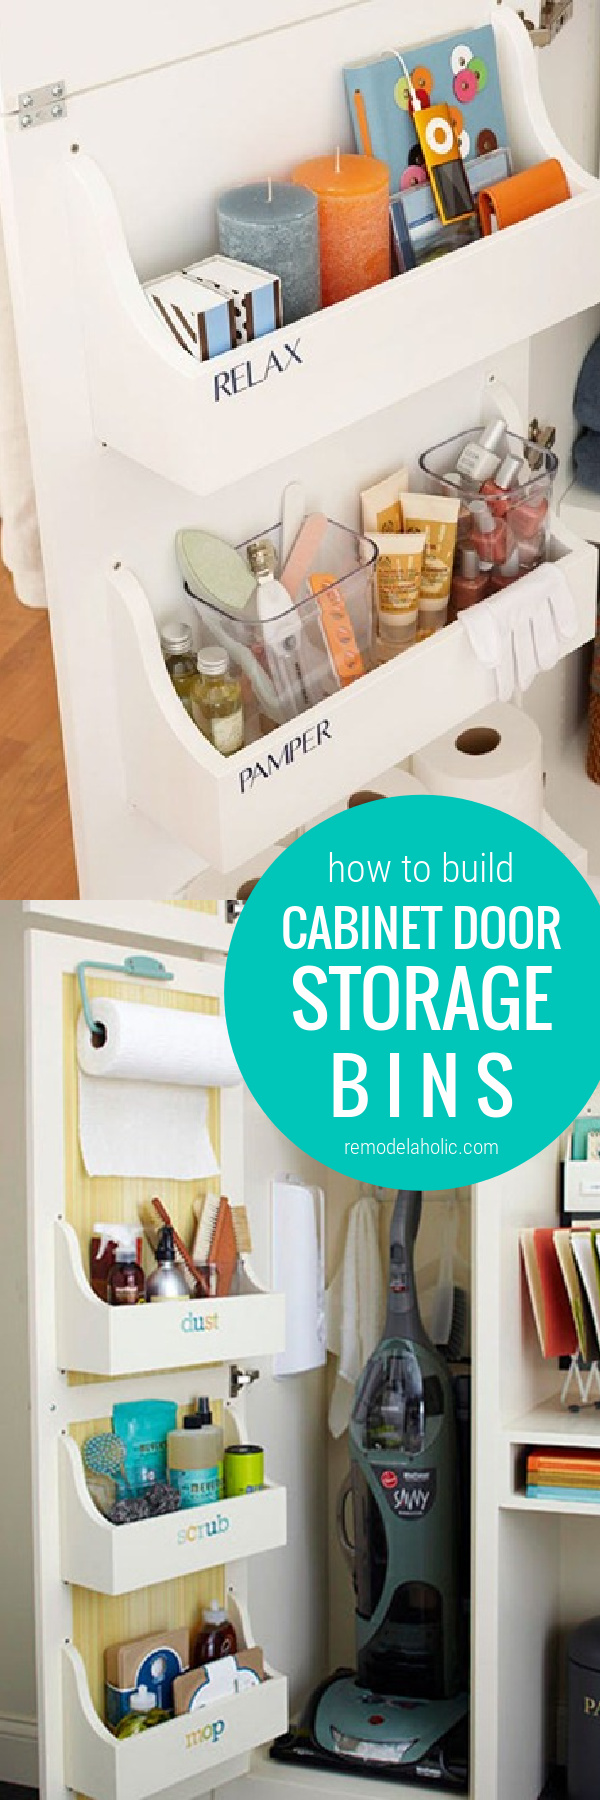 How To Build Cabinet Door Storage Bins For Under Sink Storage In Bathroom And Kitchen Cabinets #remodelaholic